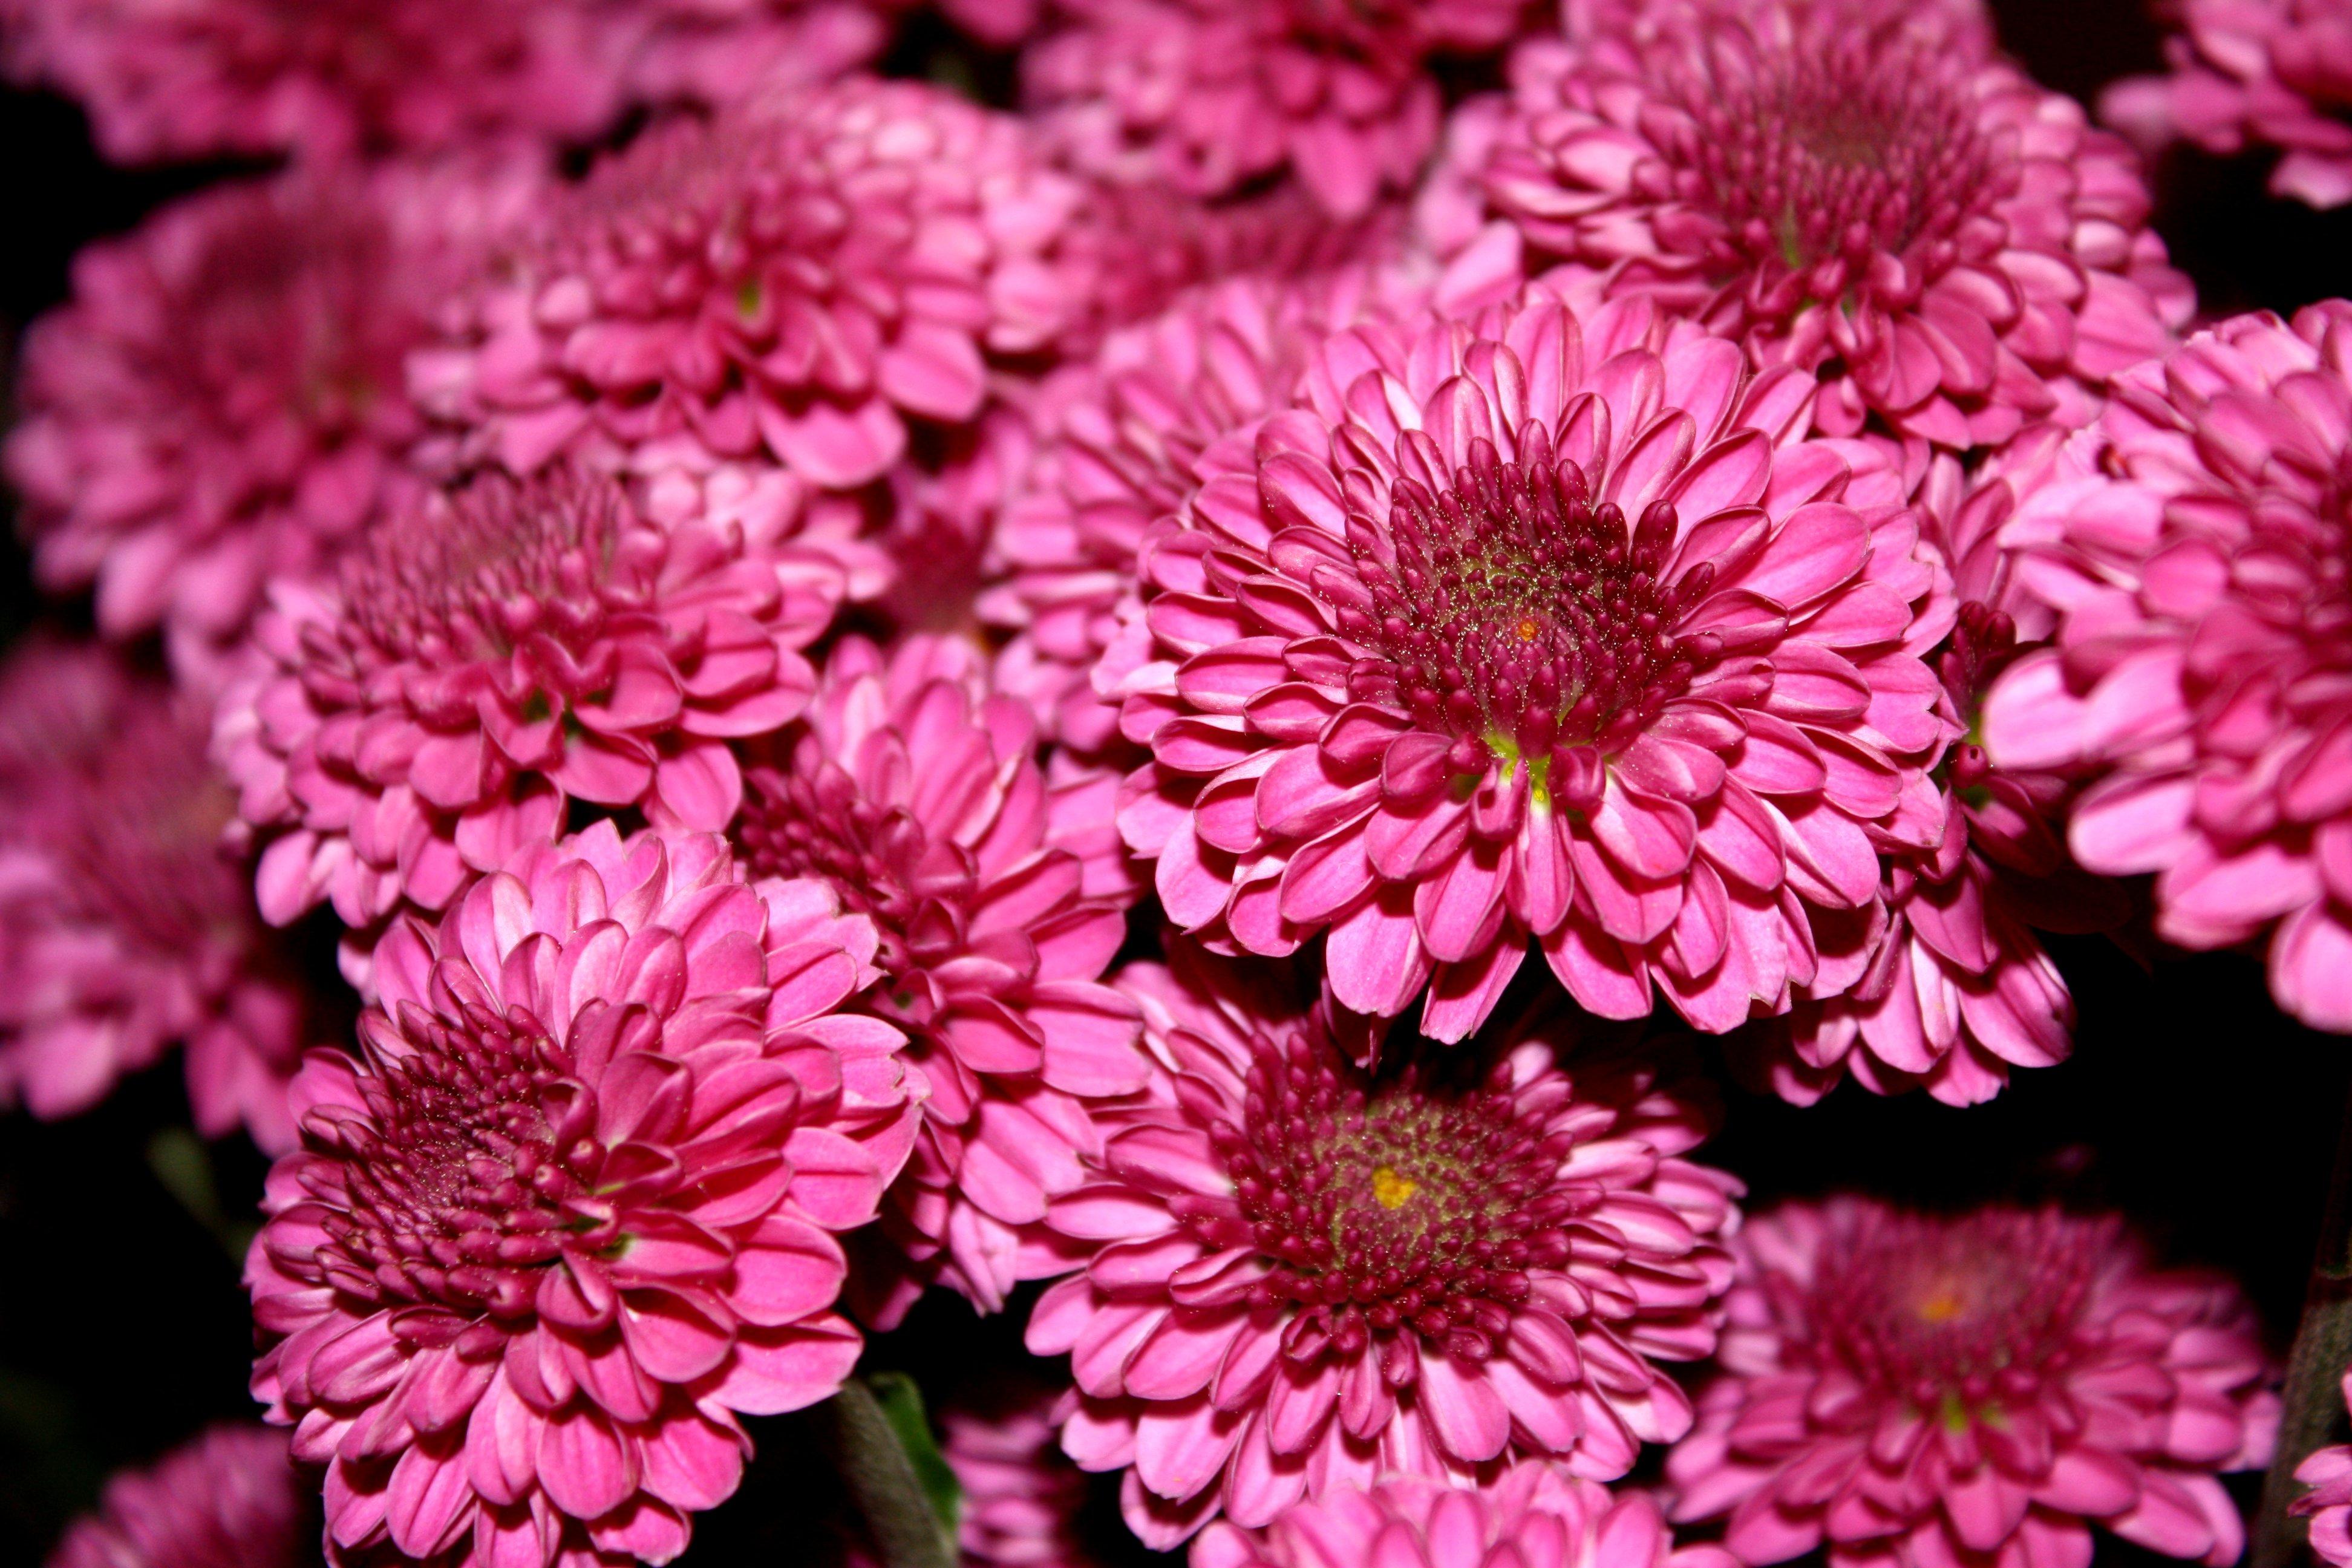 Magenta Hot Pink Chrysanthemums Close Up Picture Free